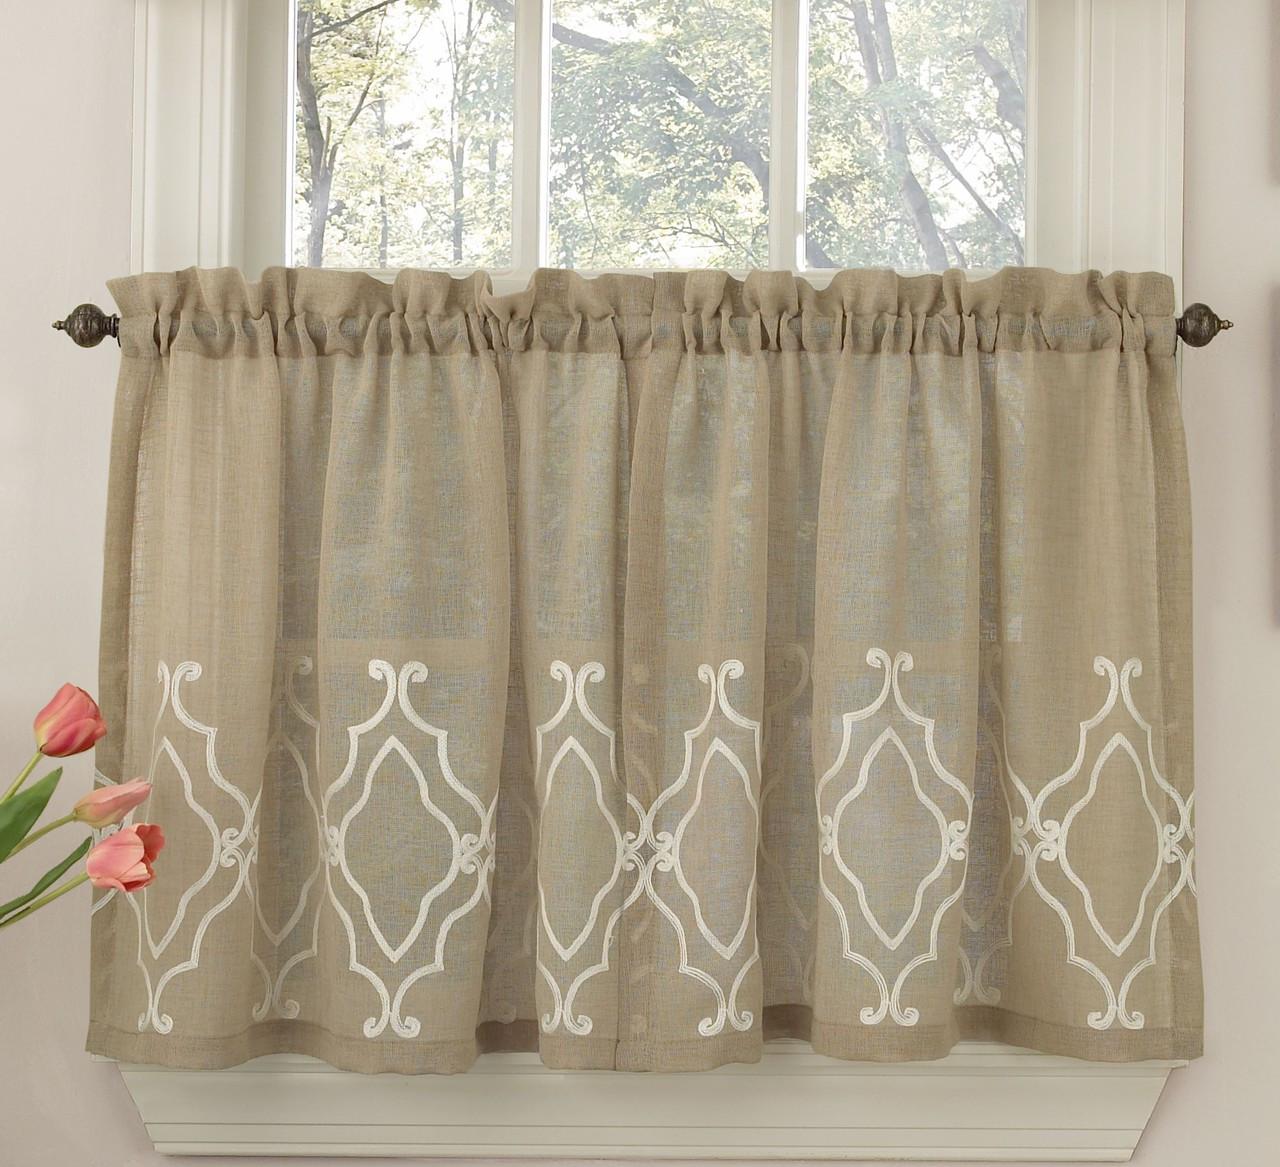 "Carlyle 24"" Kitchen Curtain Tier"